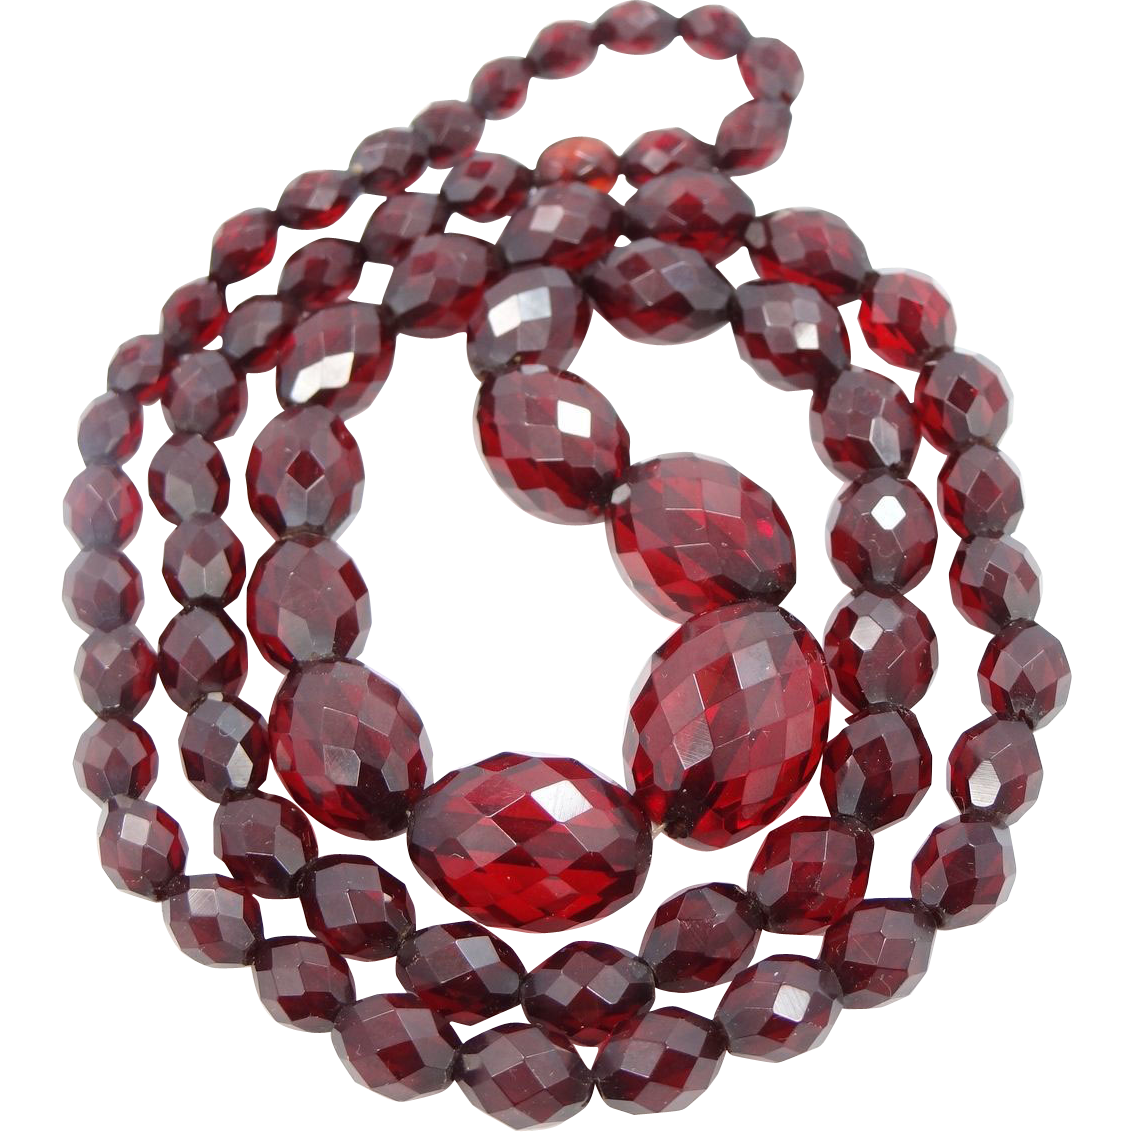 Art Deco Faceted Cherry Amber Bakelite Necklace Original Screw Clasp